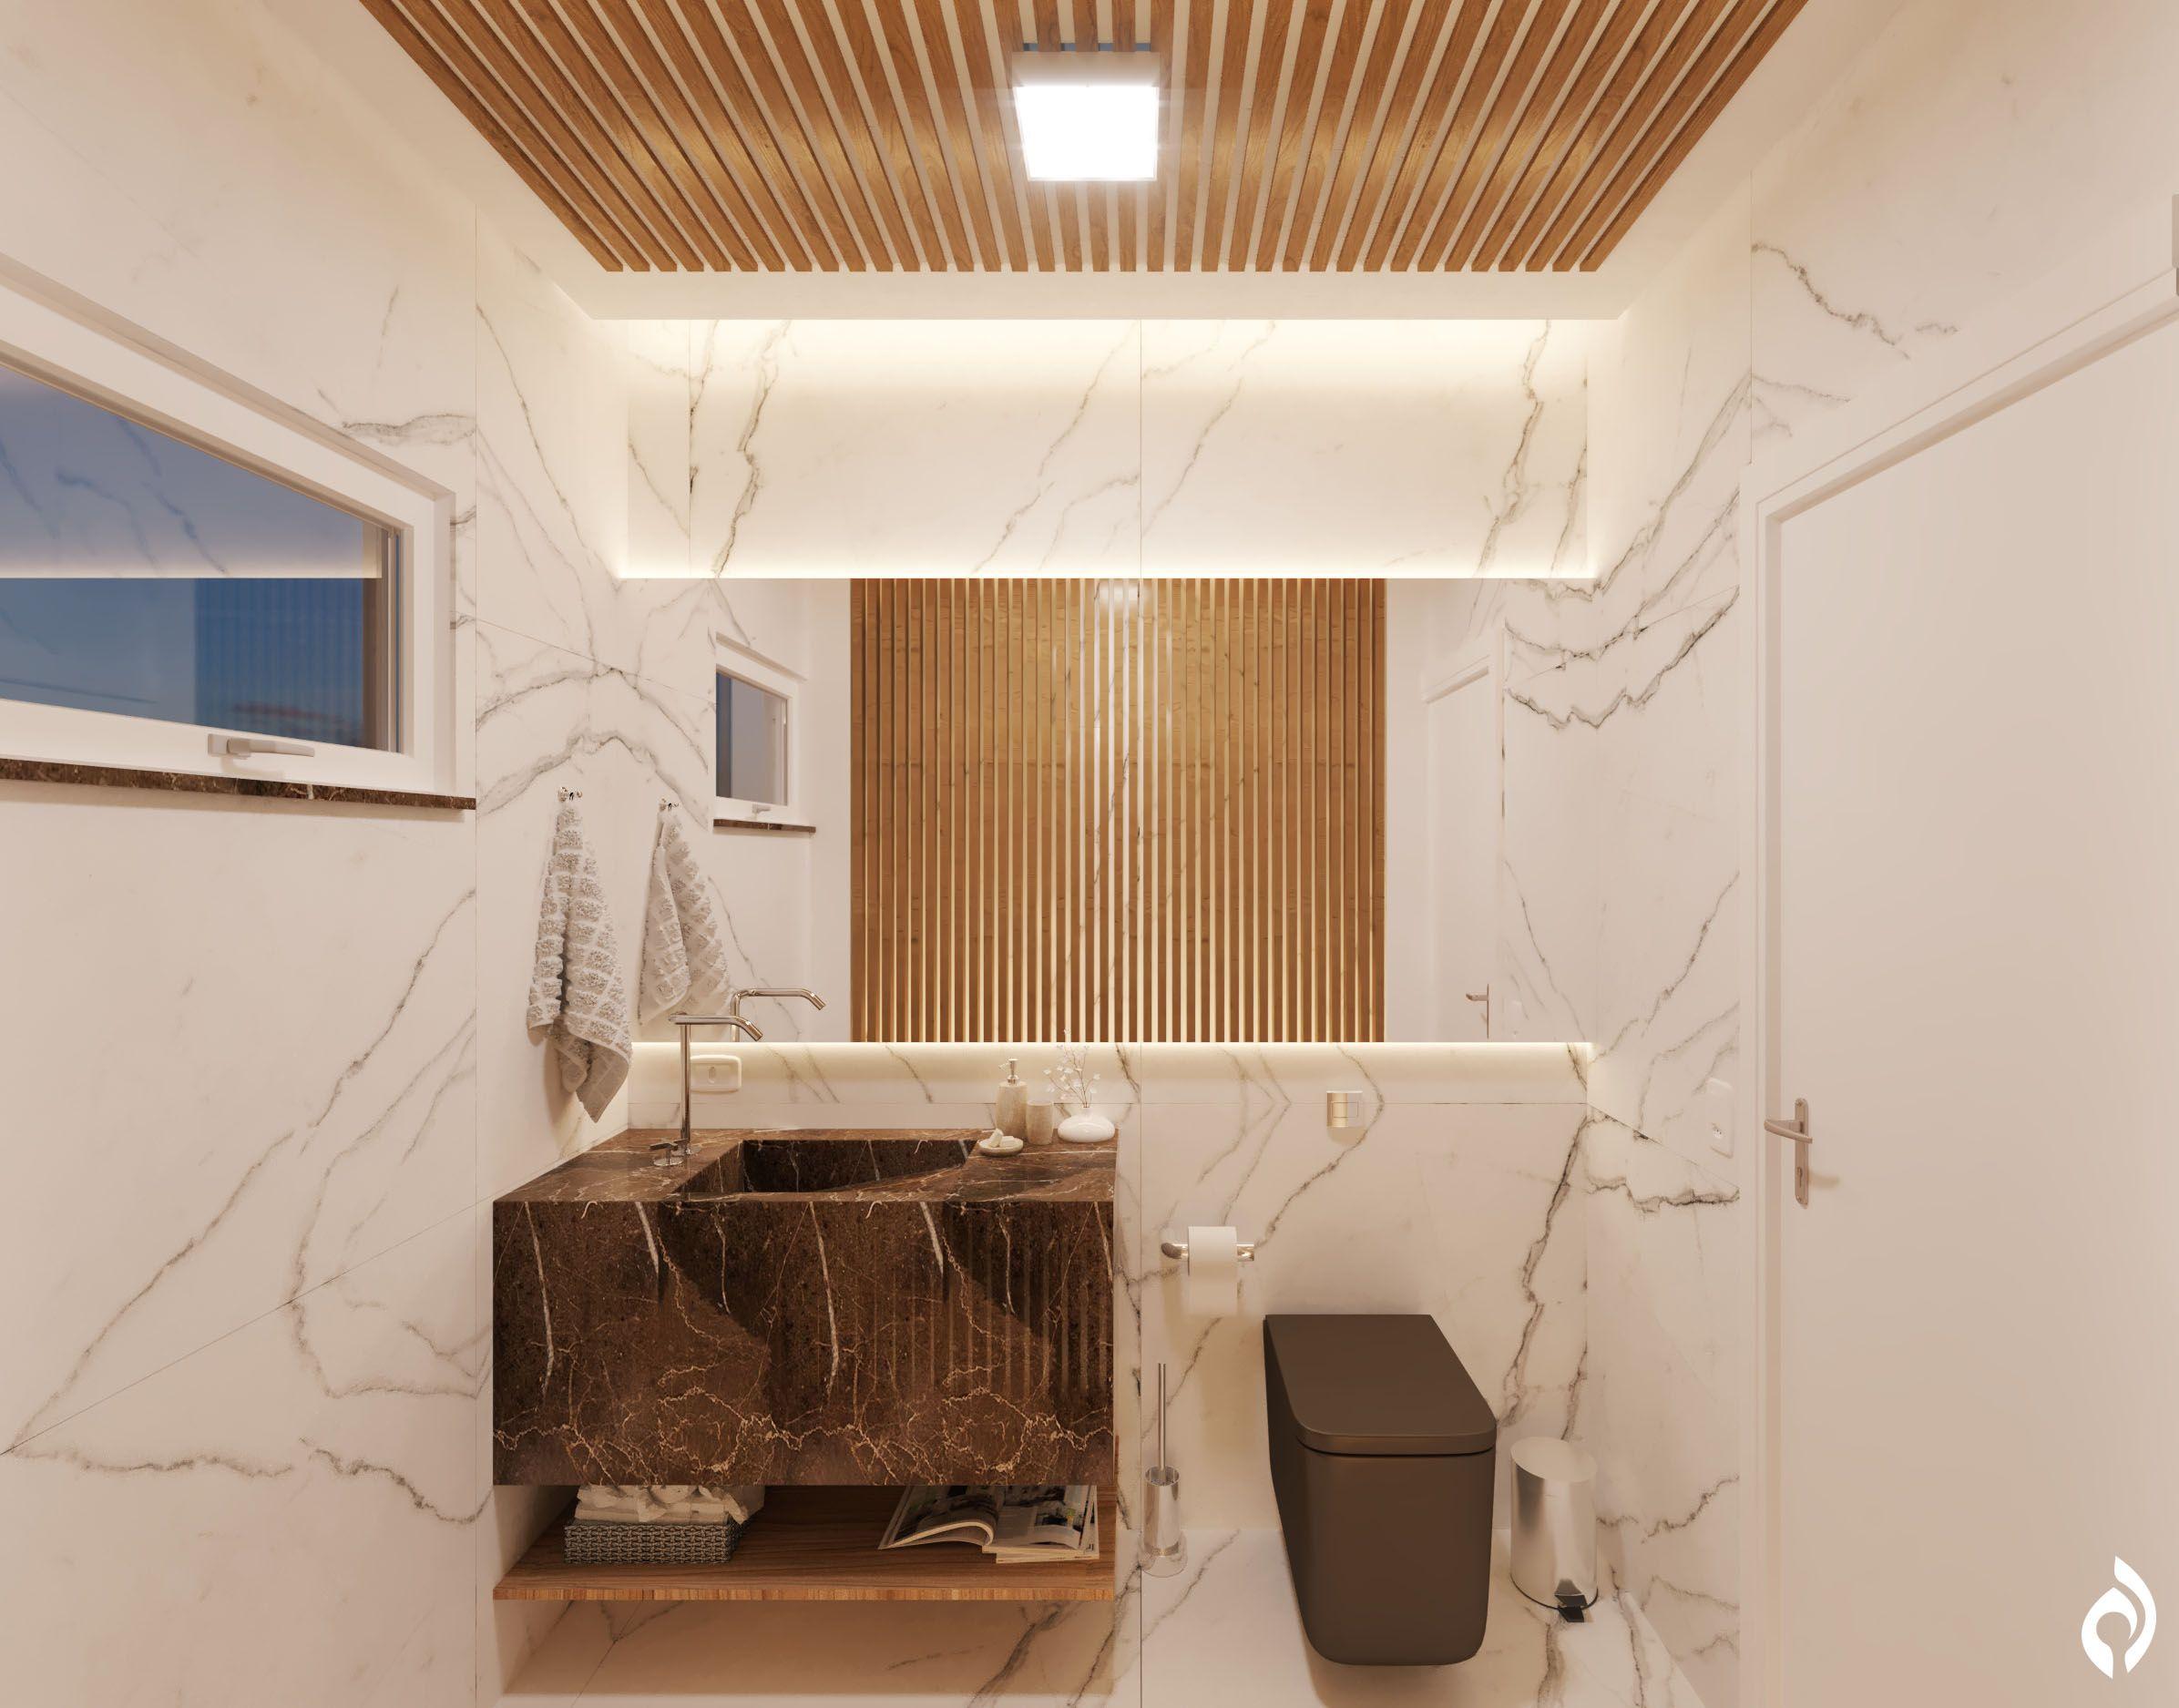 Arquitetura De Interiores Av, Ambiente Lavabo#Arquitetura #Interiores #Arquiteto #Lavabo